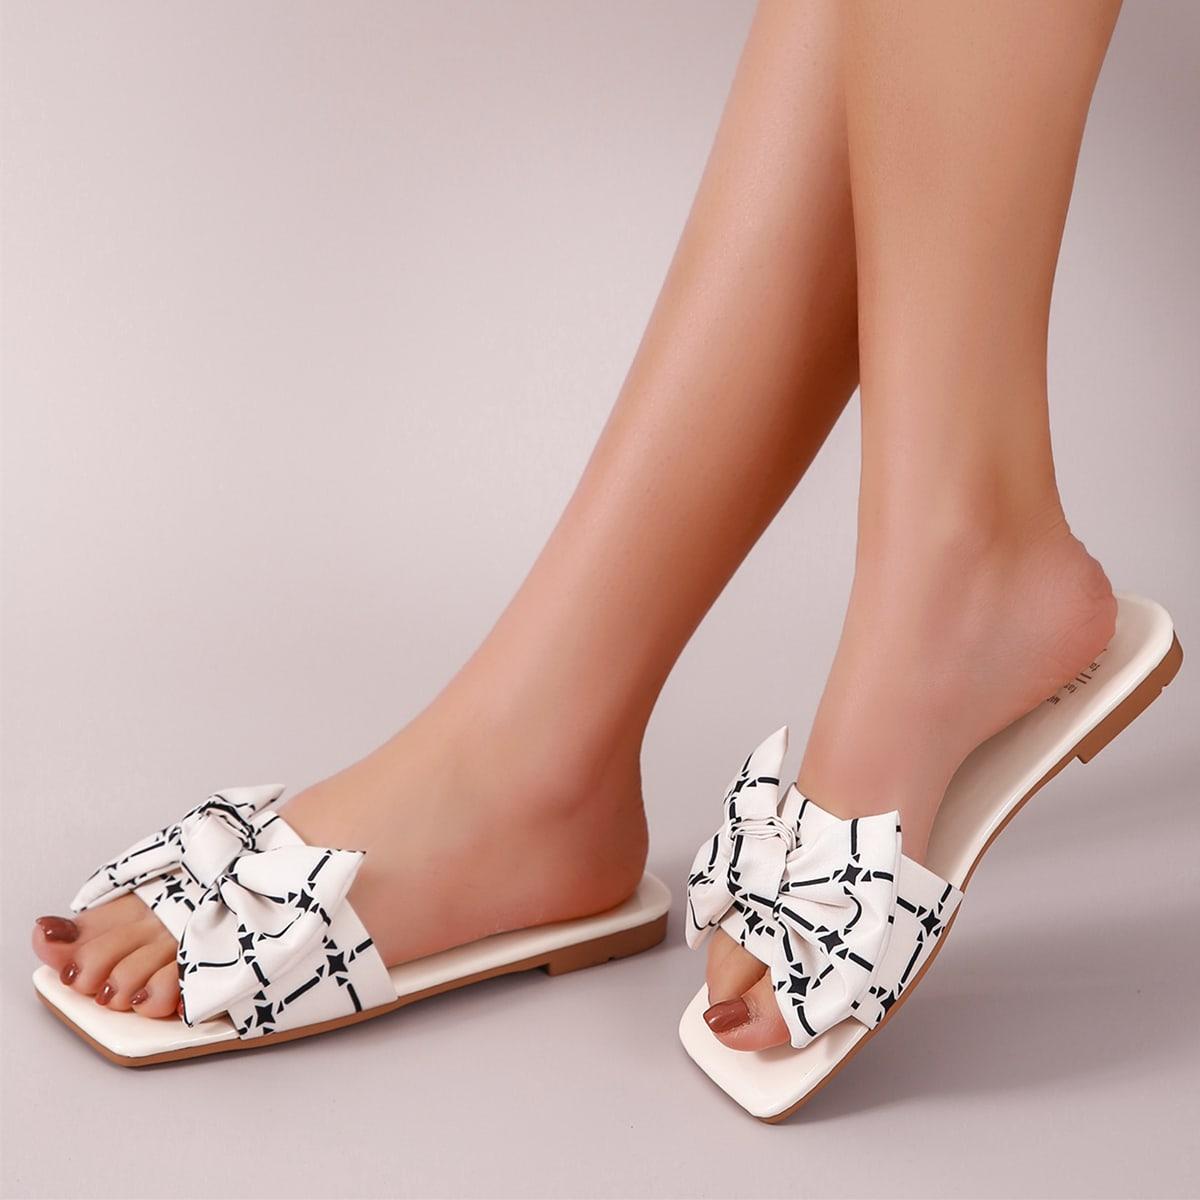 SHEIN Bow Decor Slide sandalen